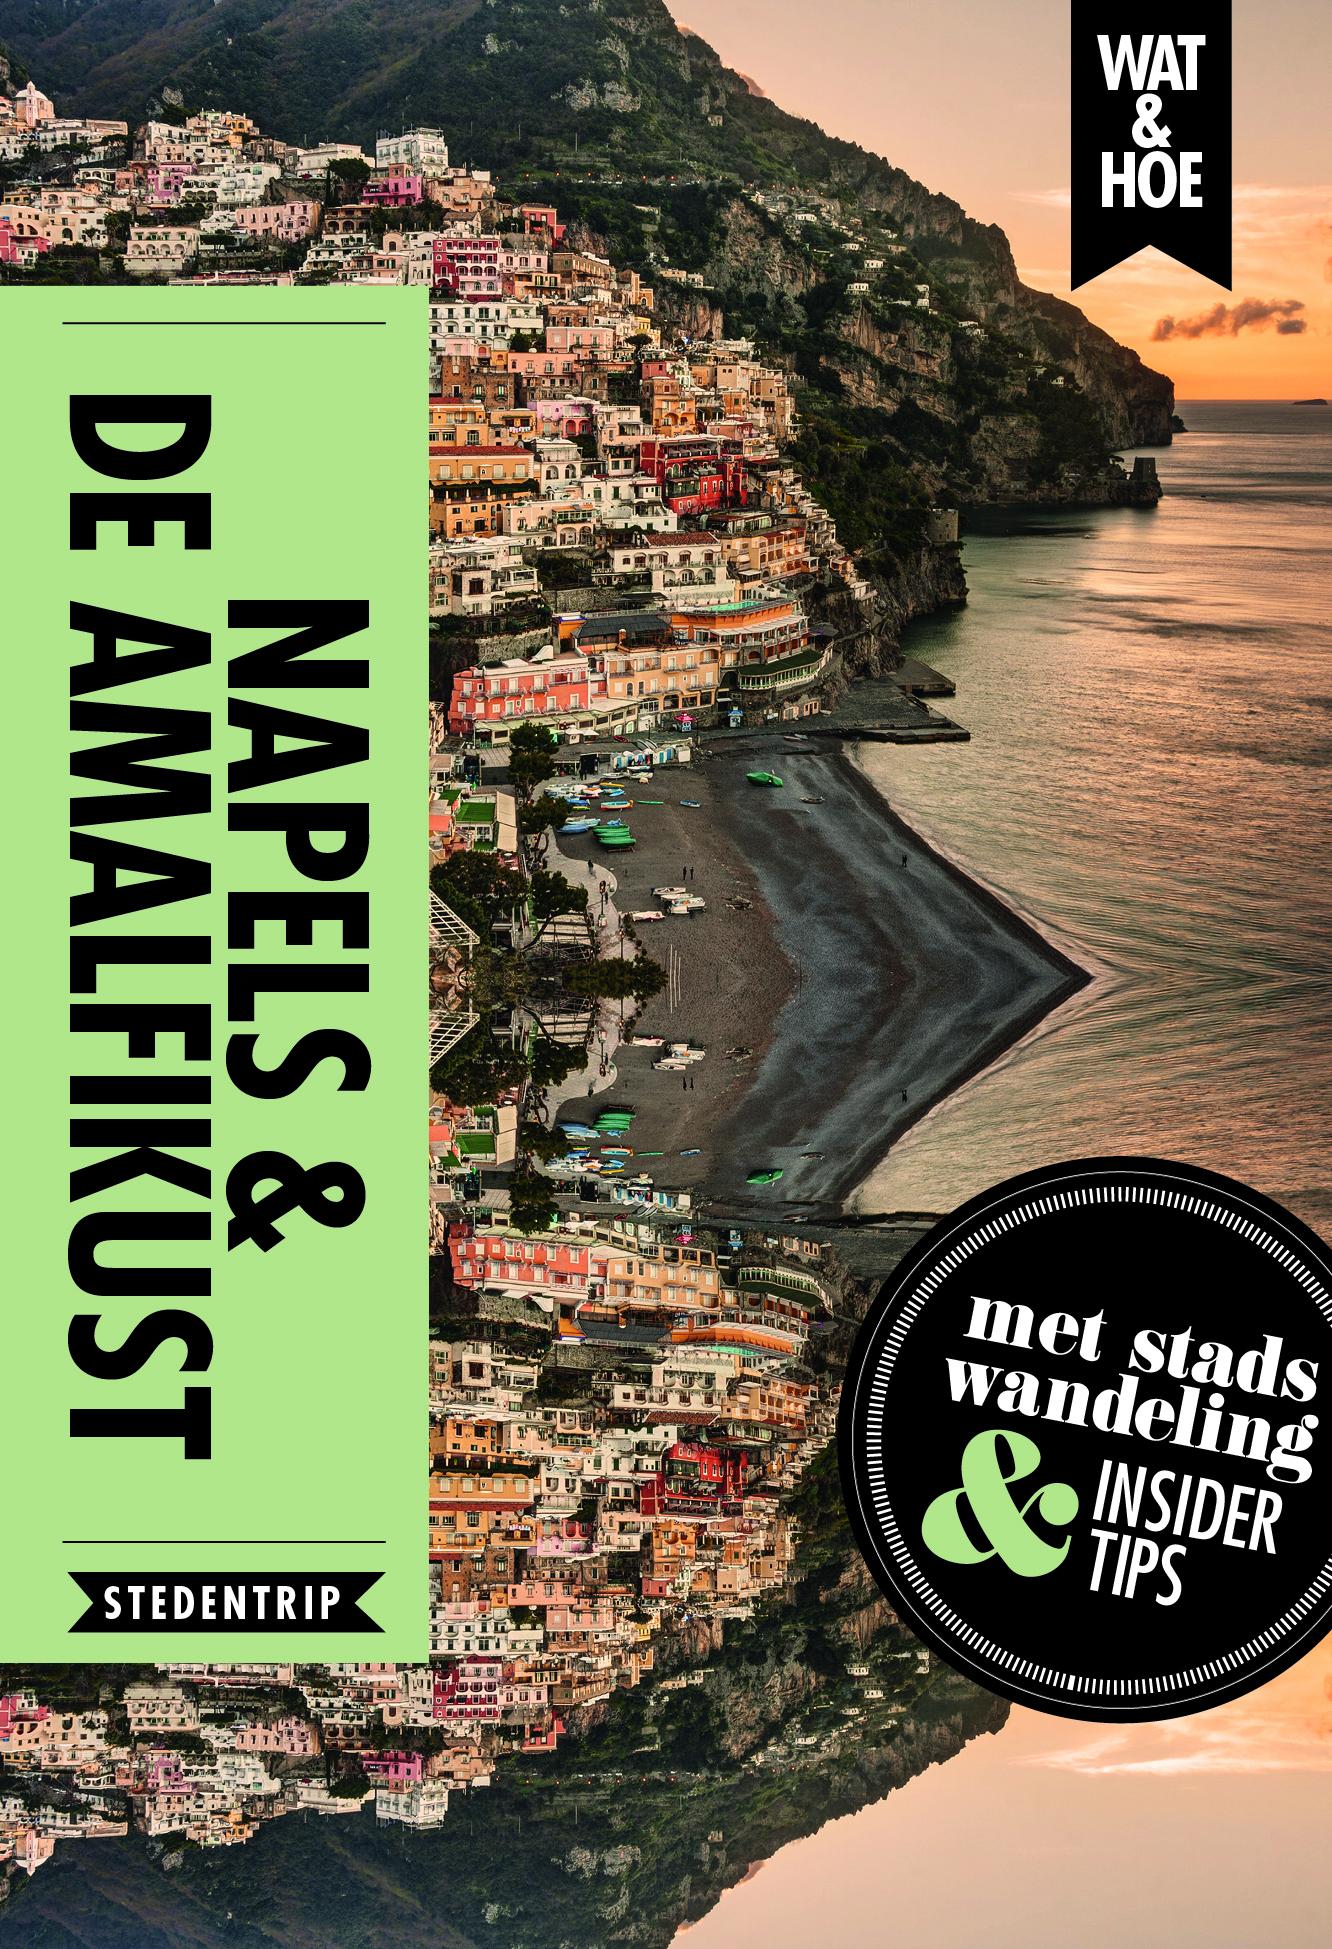 Reisgids Wat & Hoe Stedentrip Napels en de Amalfikust | Kosmos Uitgevers de zwerver